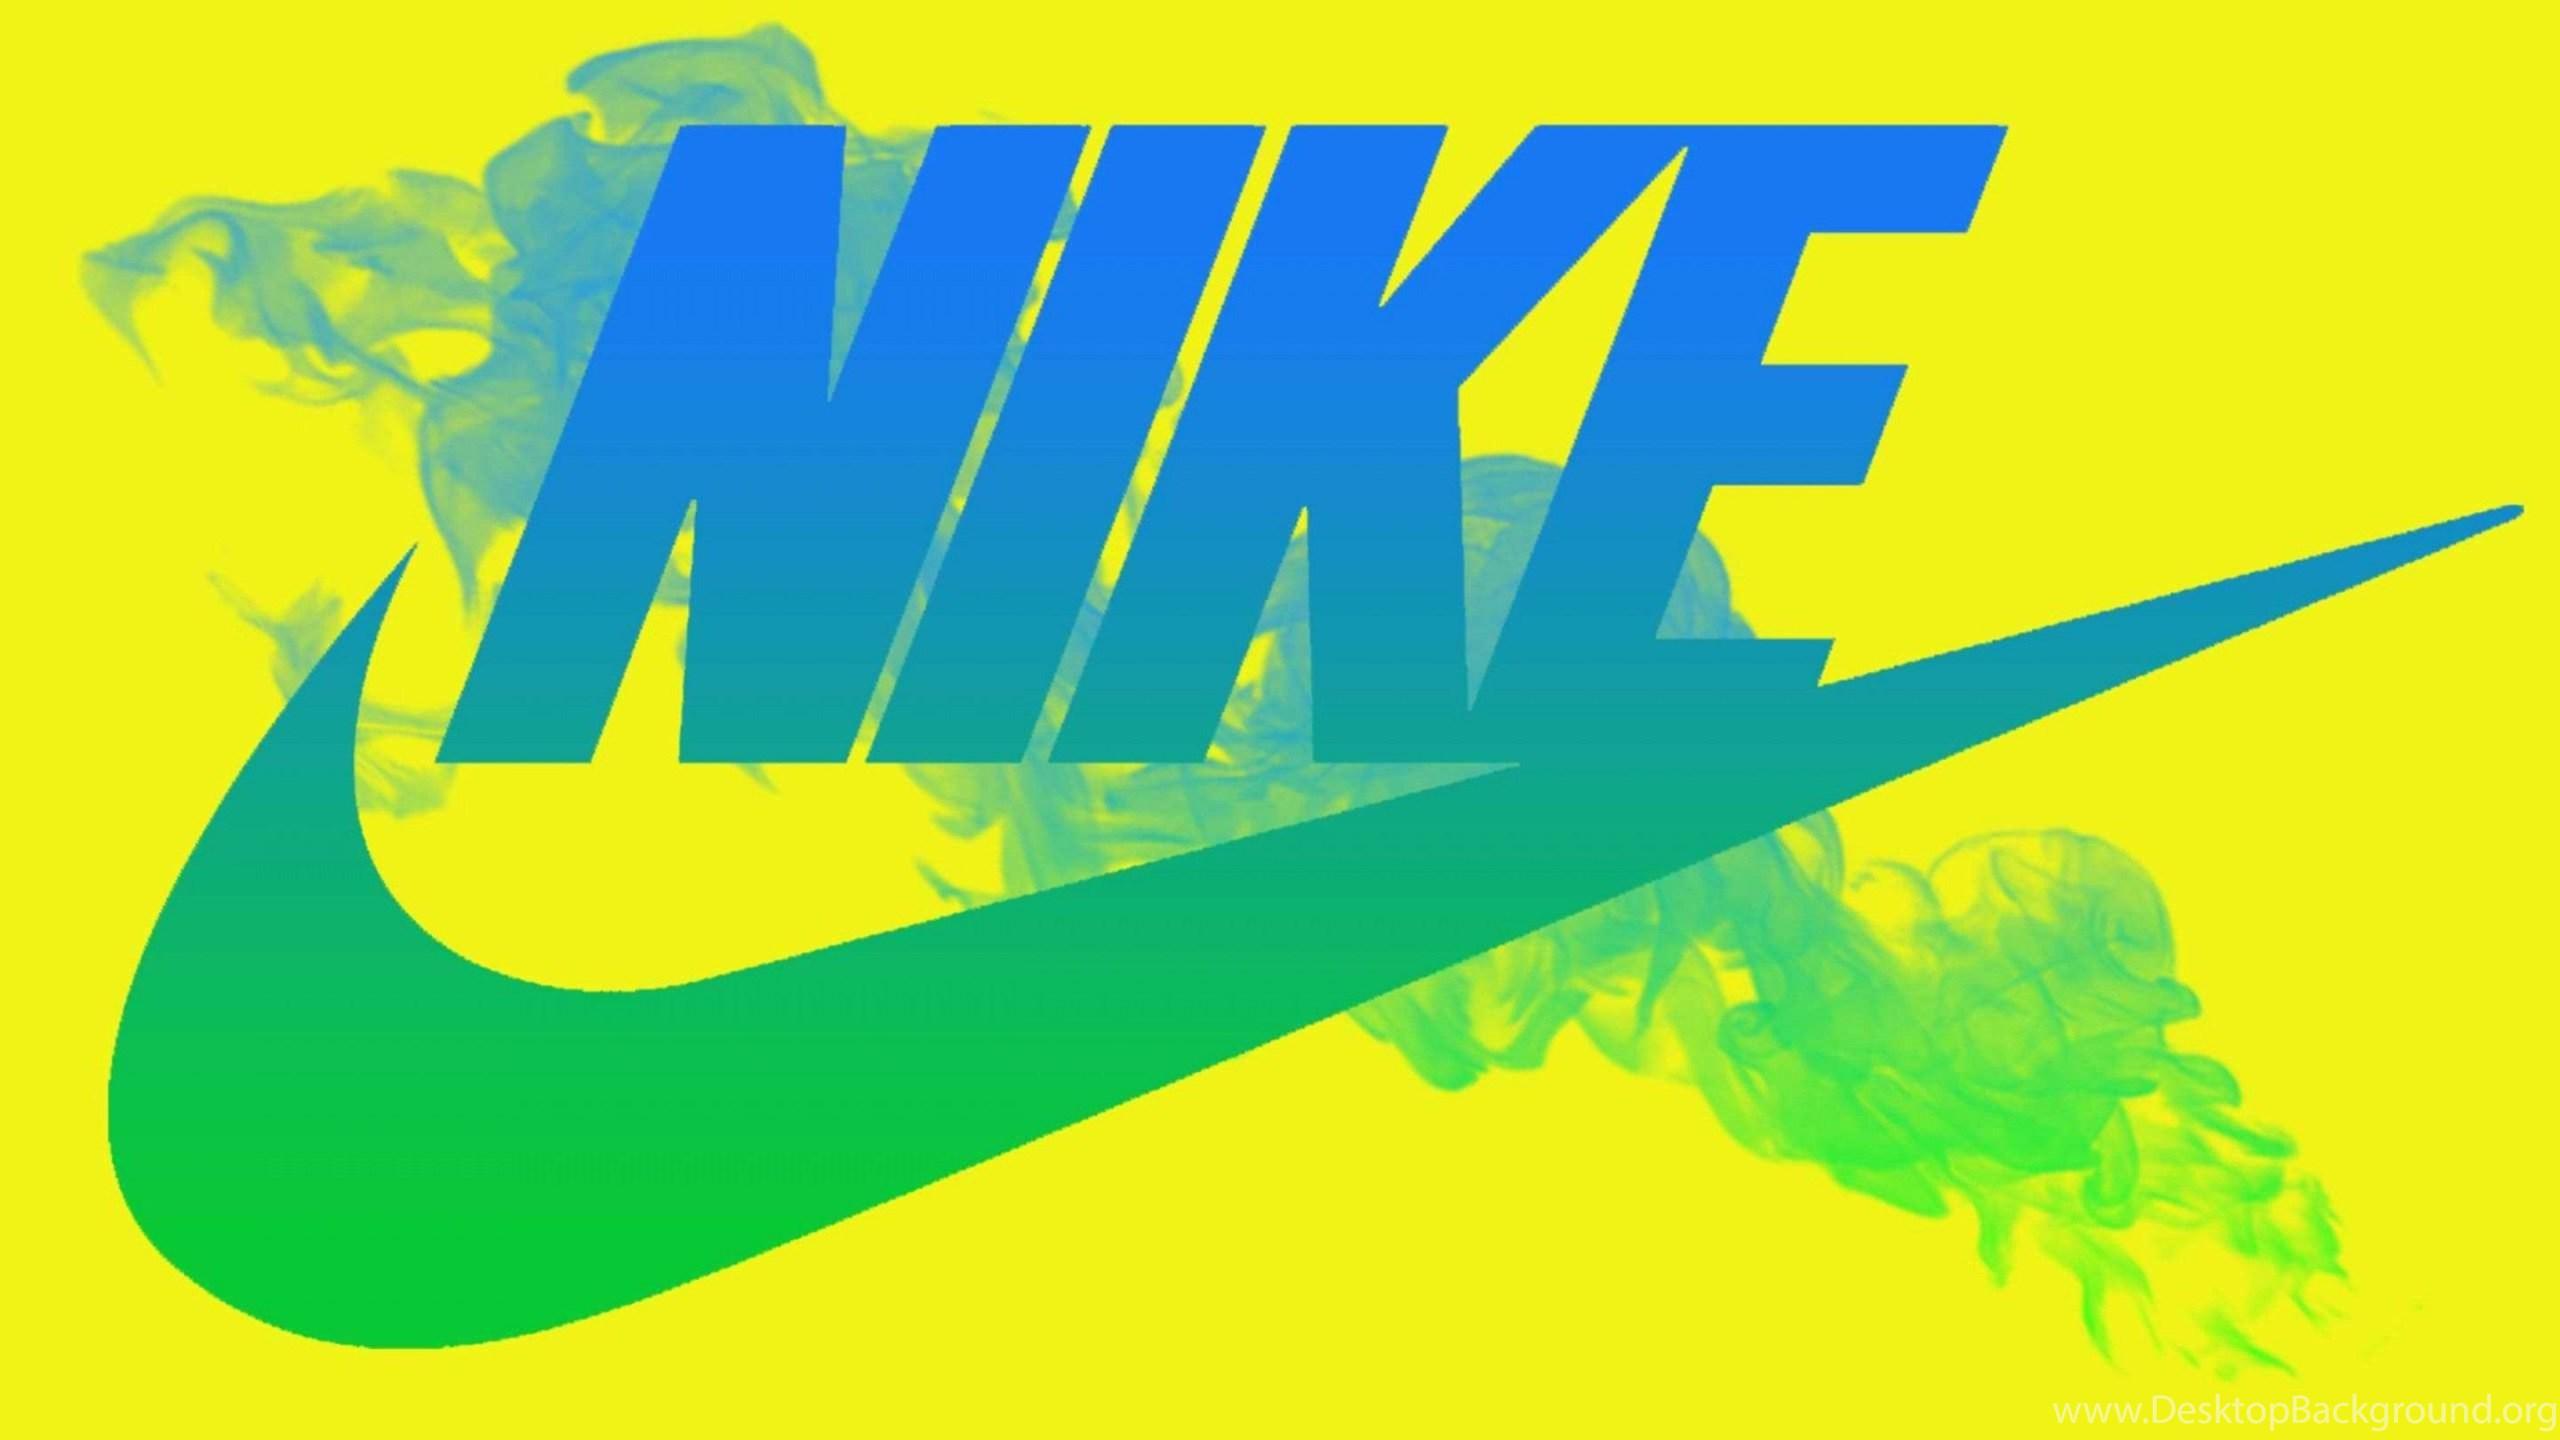 Download Nike Just Do It Wallpapers Hd Resolution Desktop Background